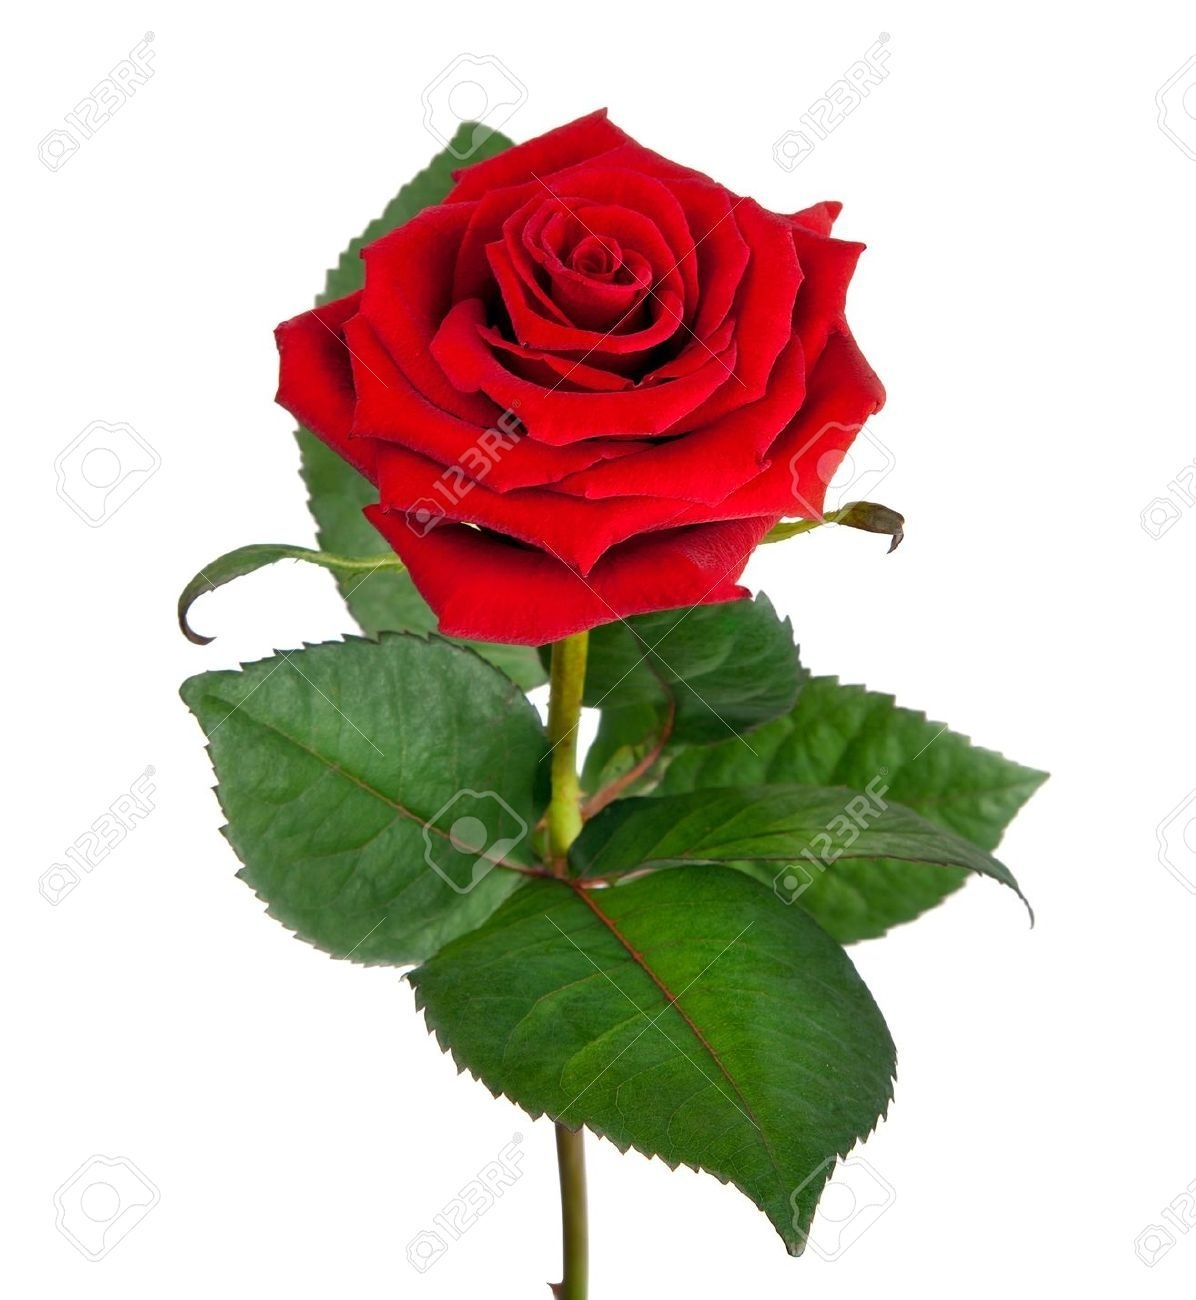 flowers a single red rose wallpapers (desktop, phone, tablet